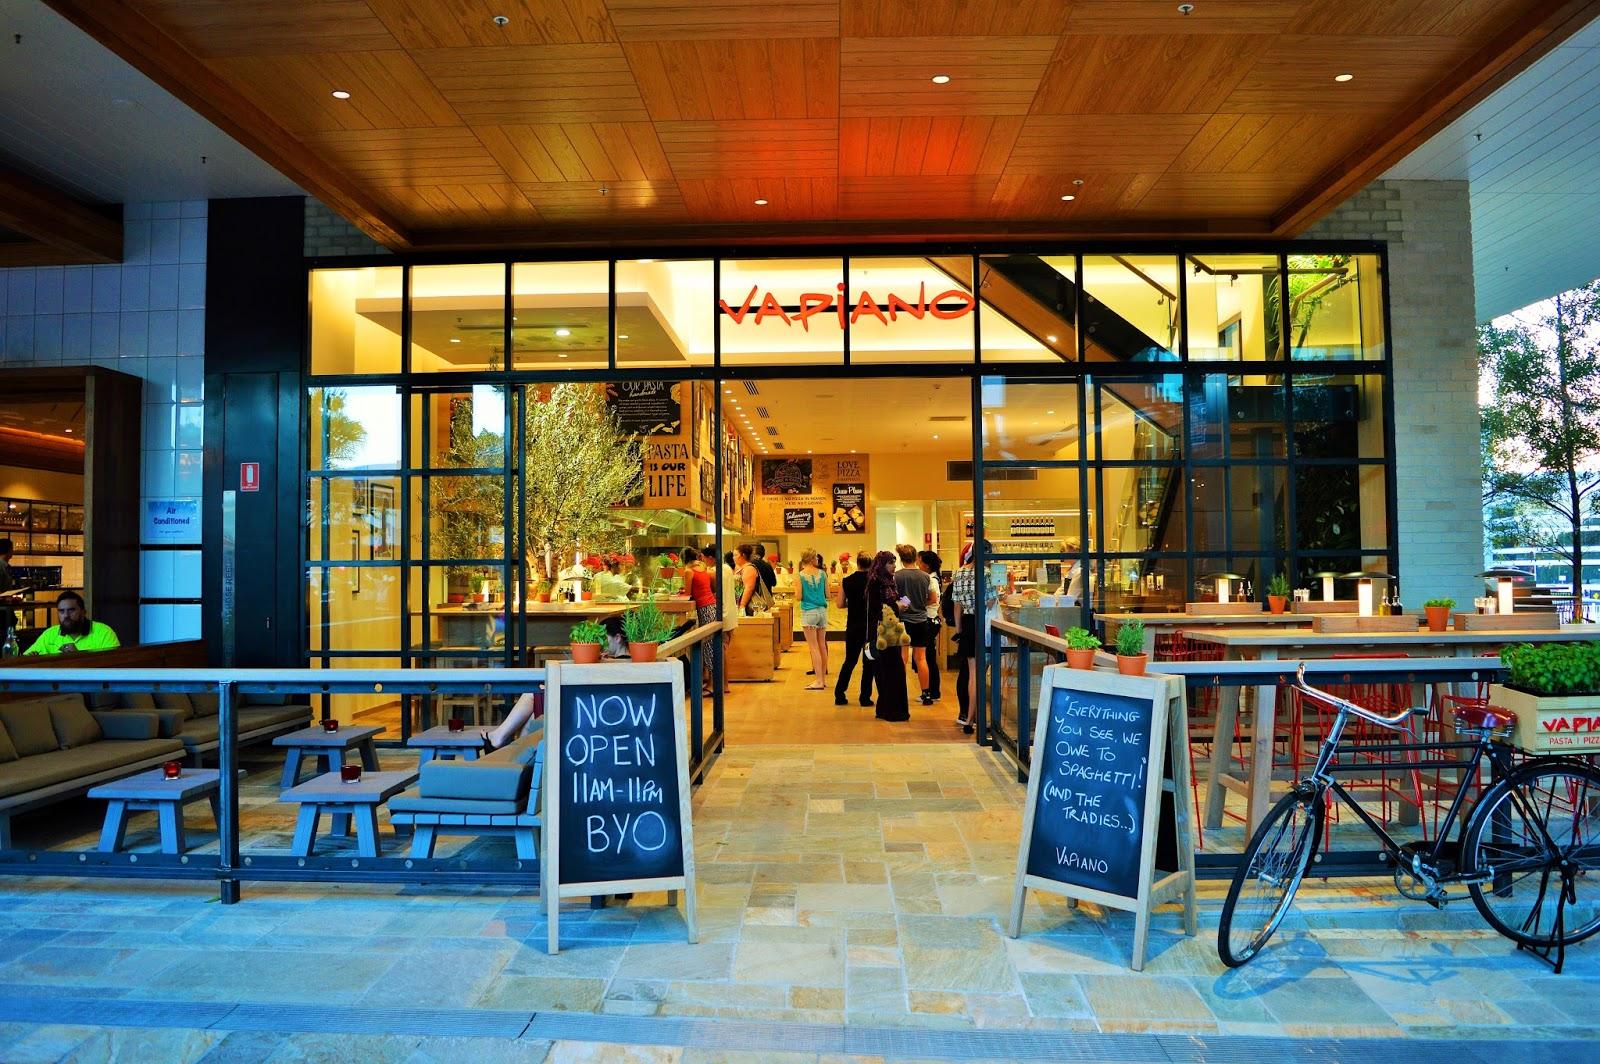 A Taste Of Italy New Vapiano Restaurant Opens Garden City Ameriaus